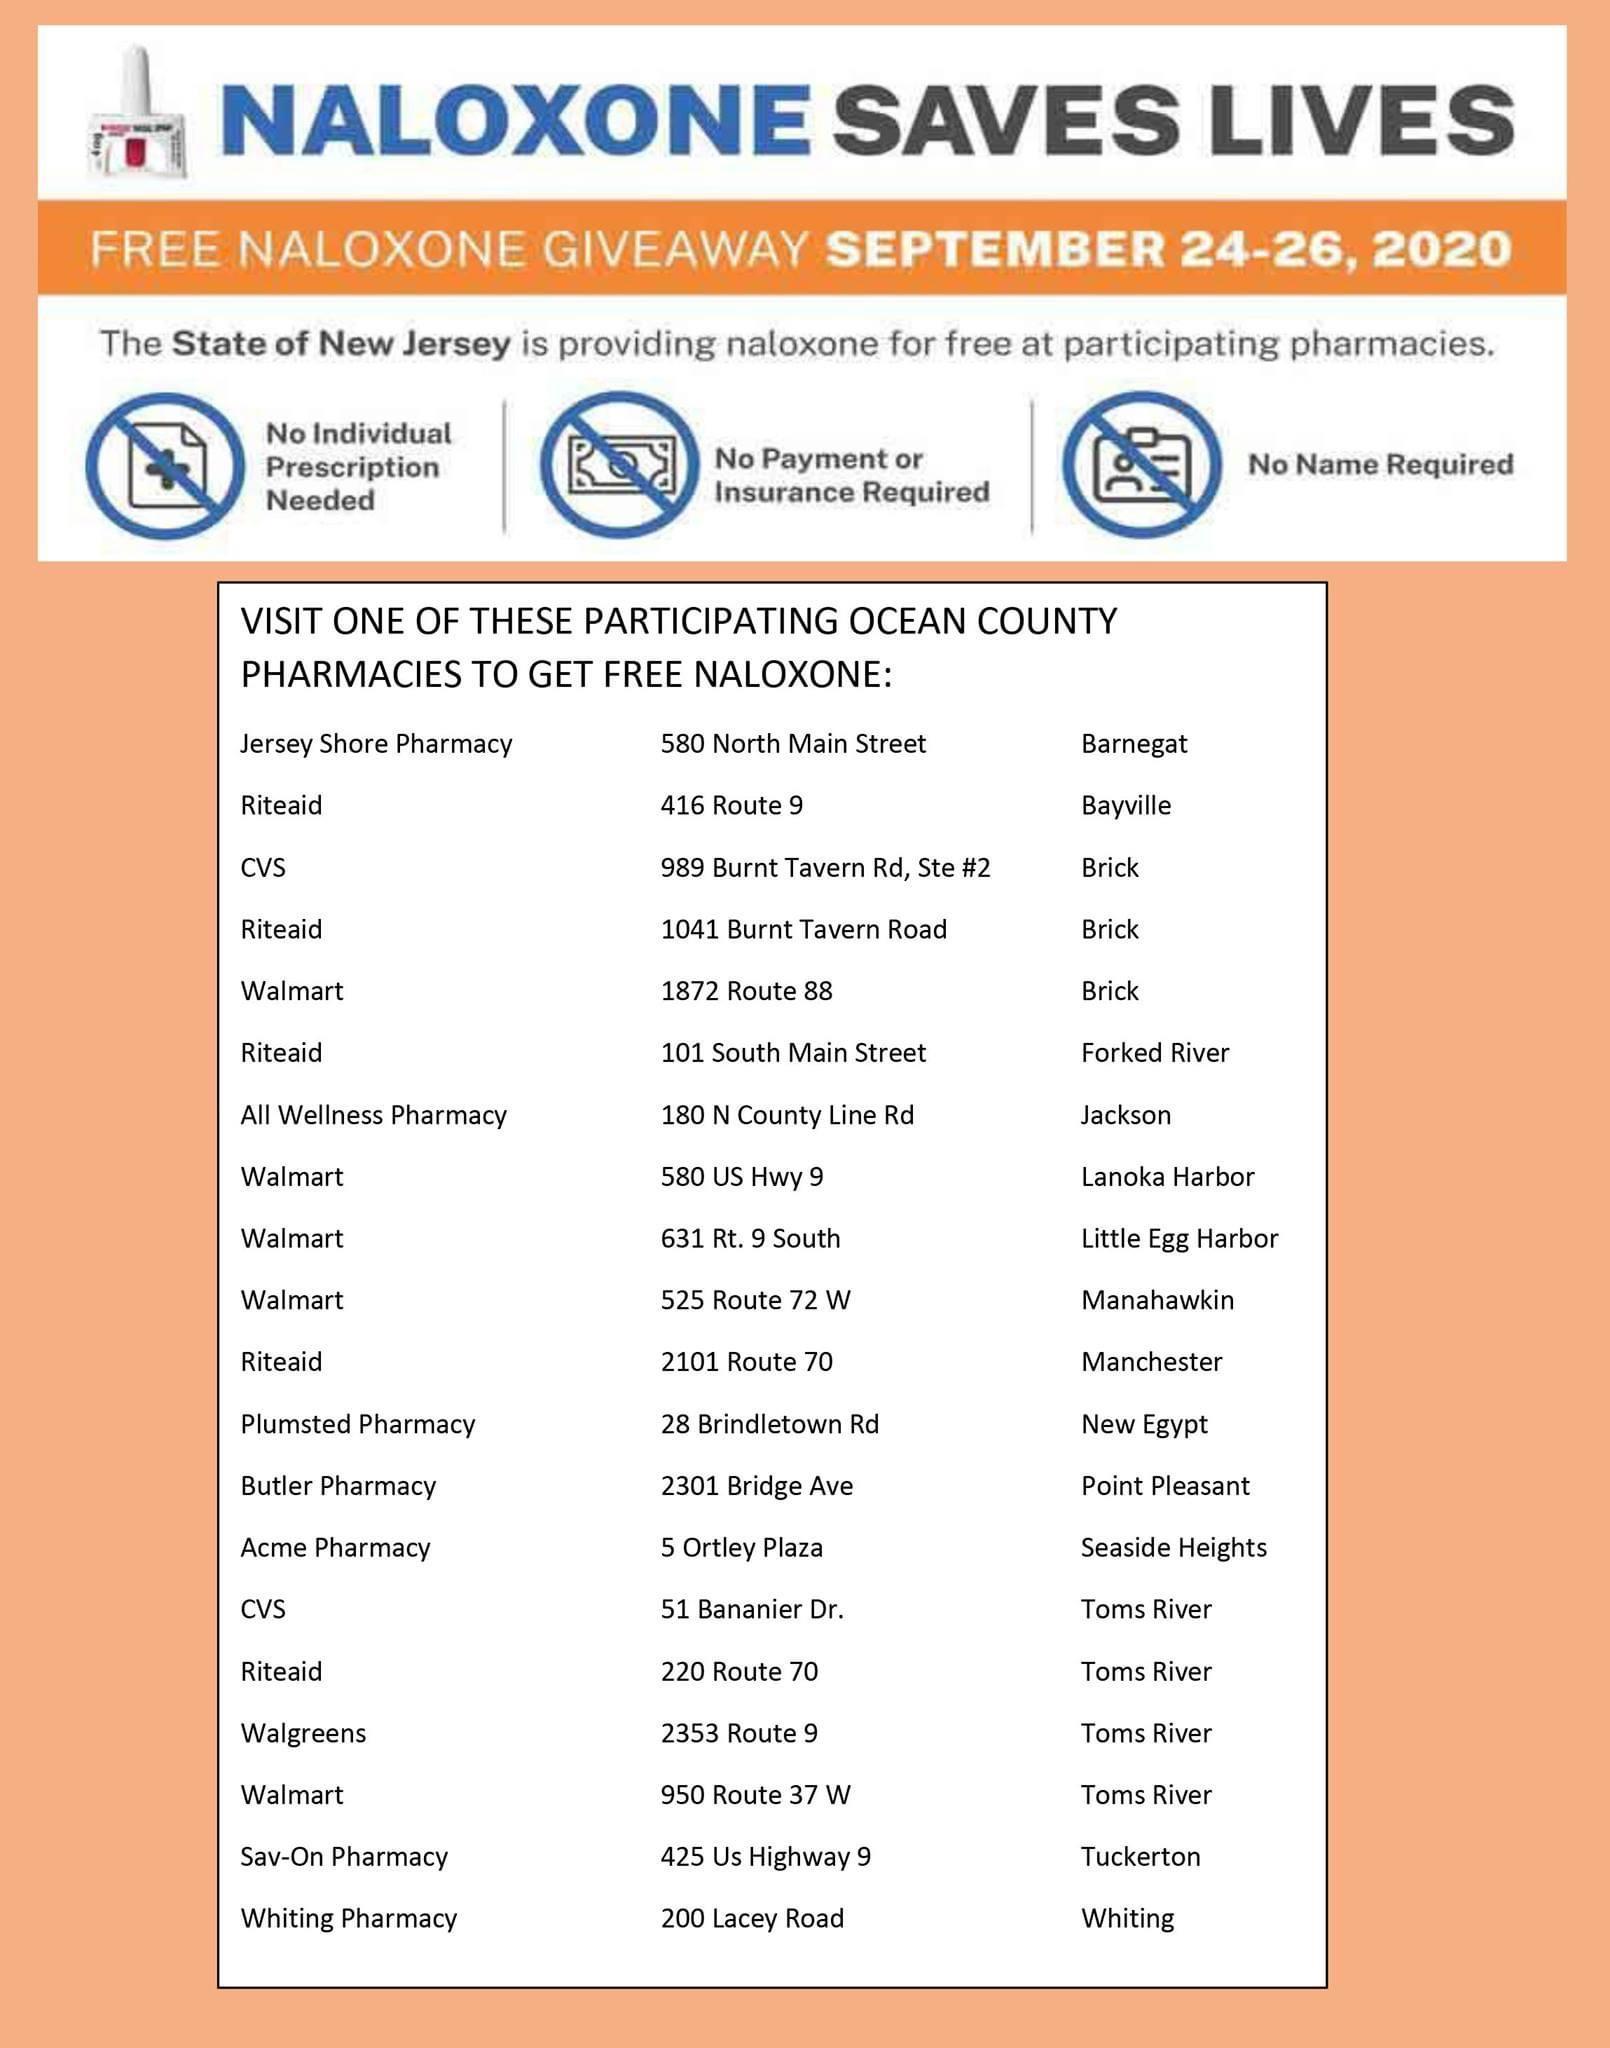 FREE Narcan Kits: September 24-26 @ Participating Pharmacies in NJ